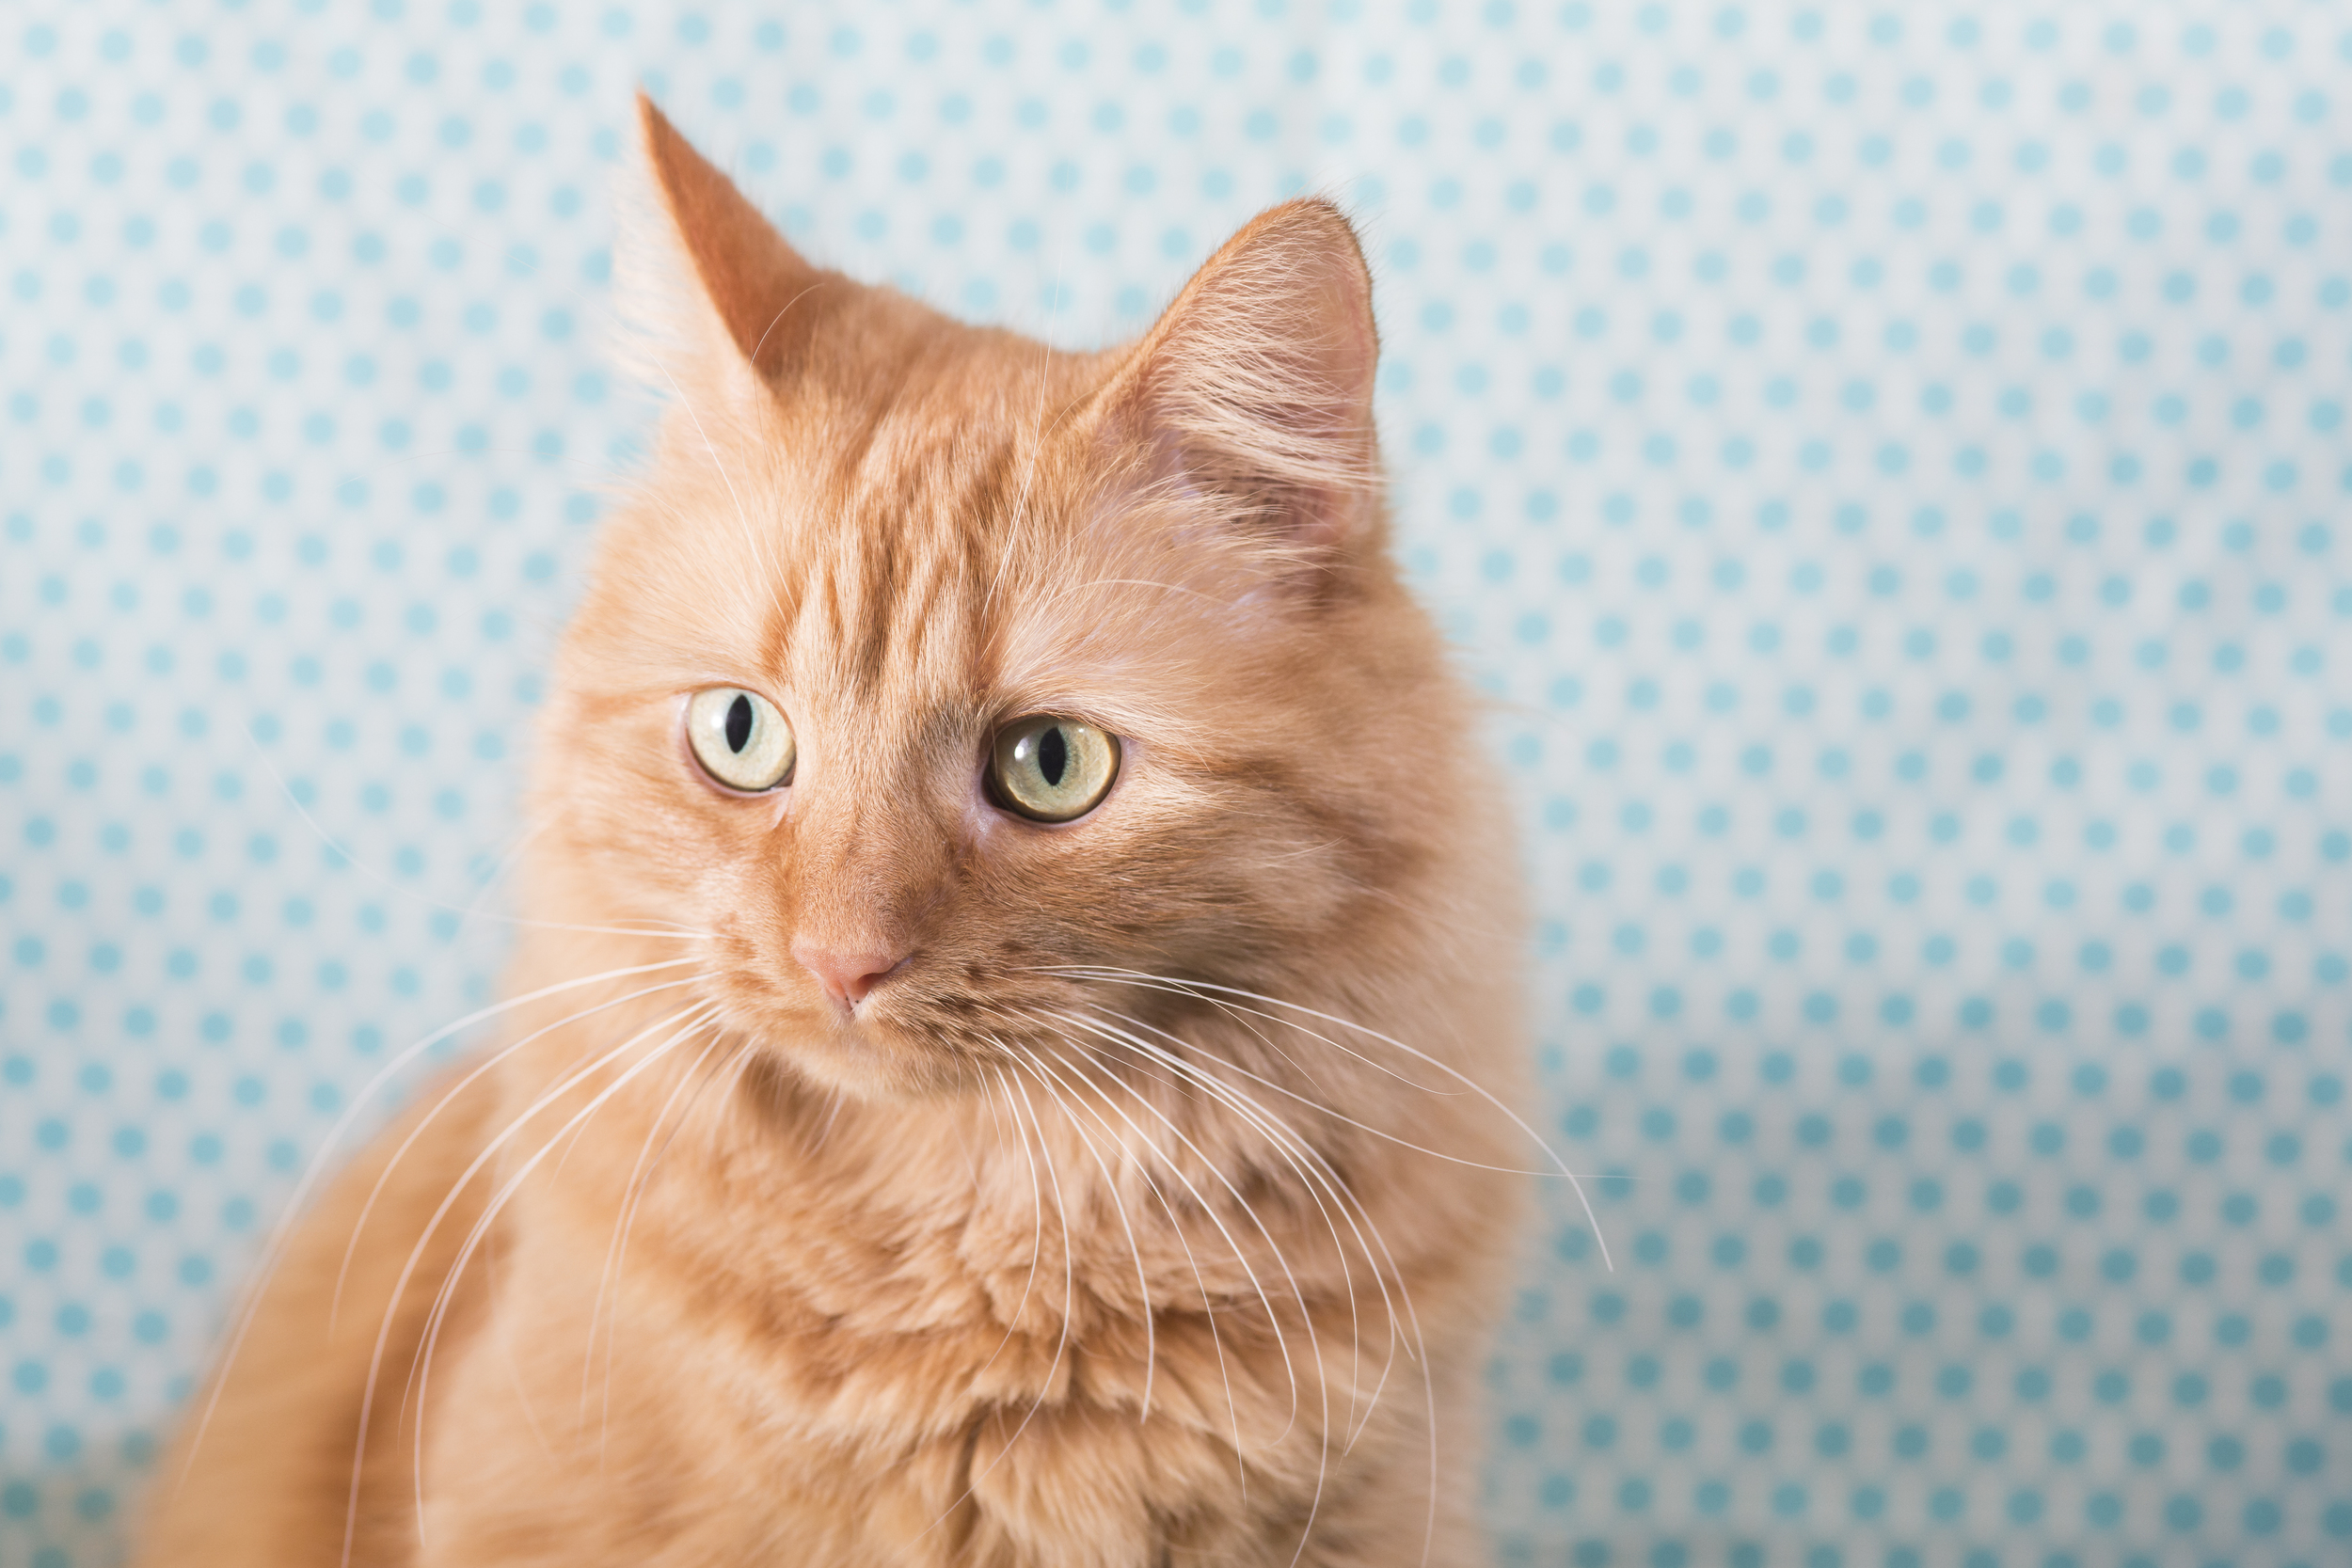 03 orange cat pet photography studio session on blue polka dot fabric.jpg